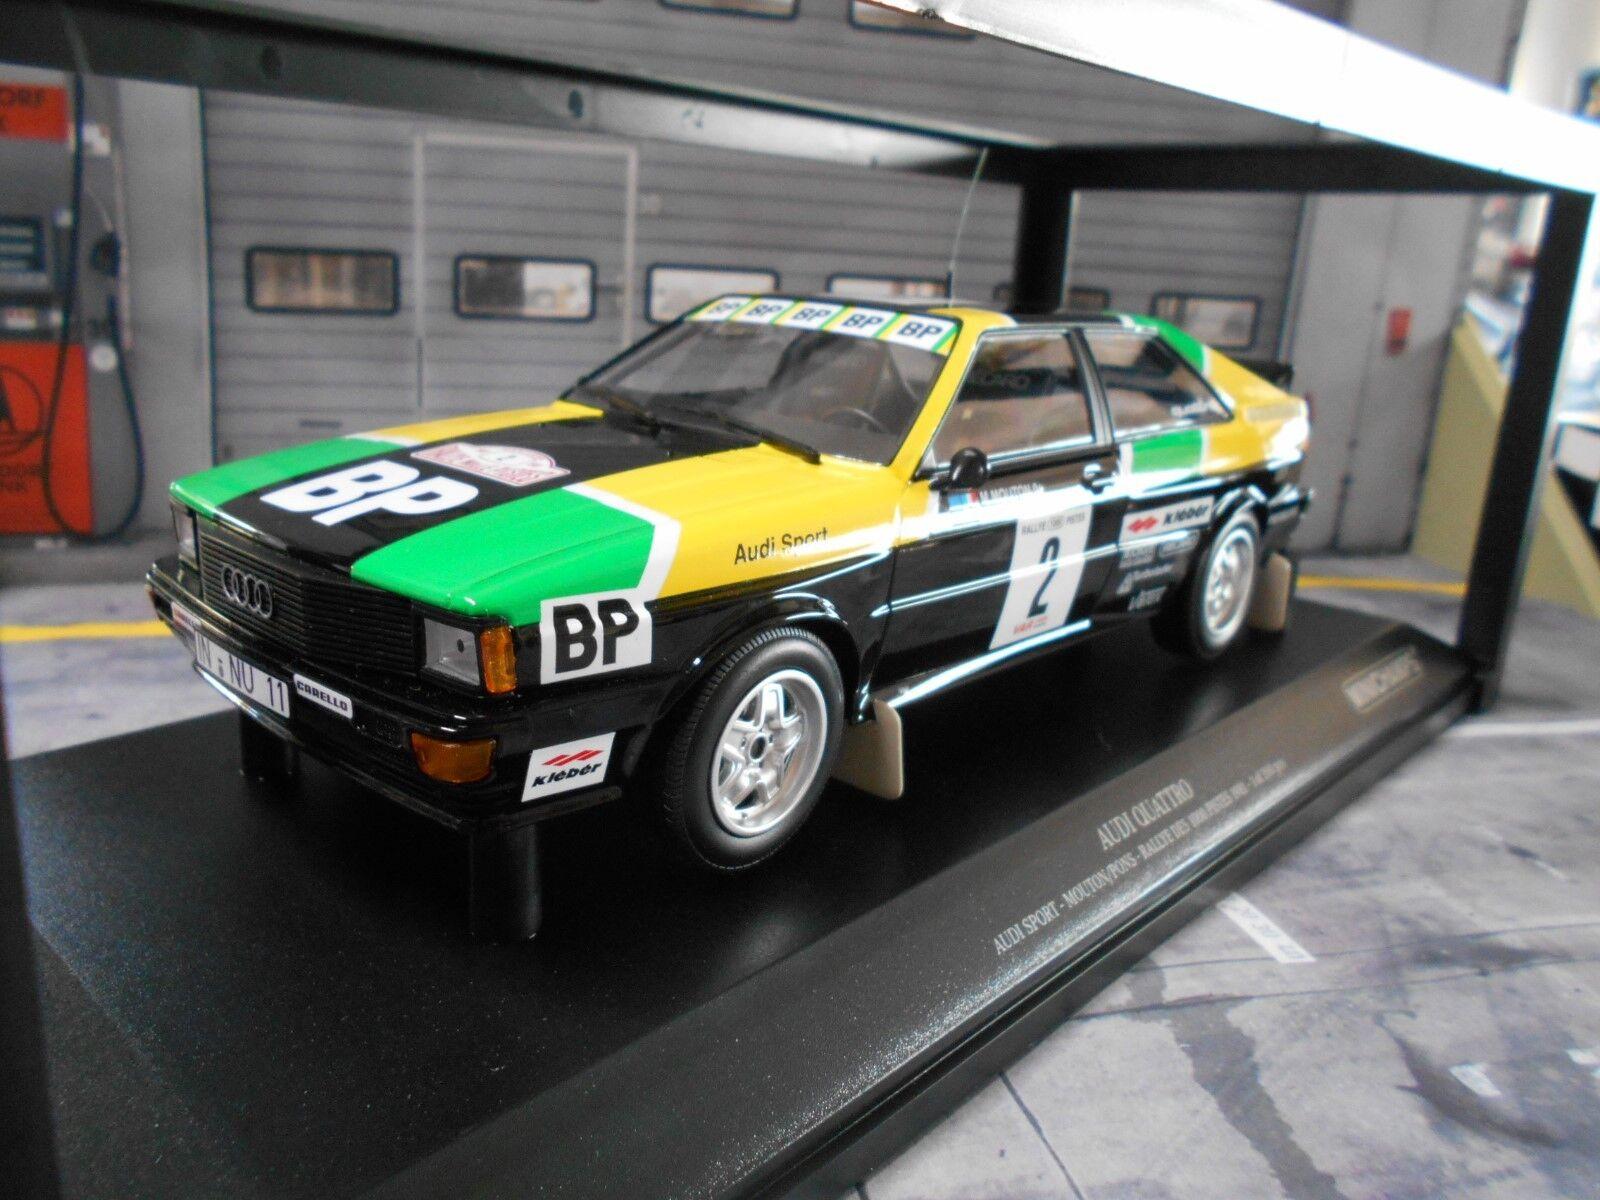 AUDI QUATTRO RALLYE taille 4 1000 pistes 1981  2 mouton BP New MINICHAMPS 1 18